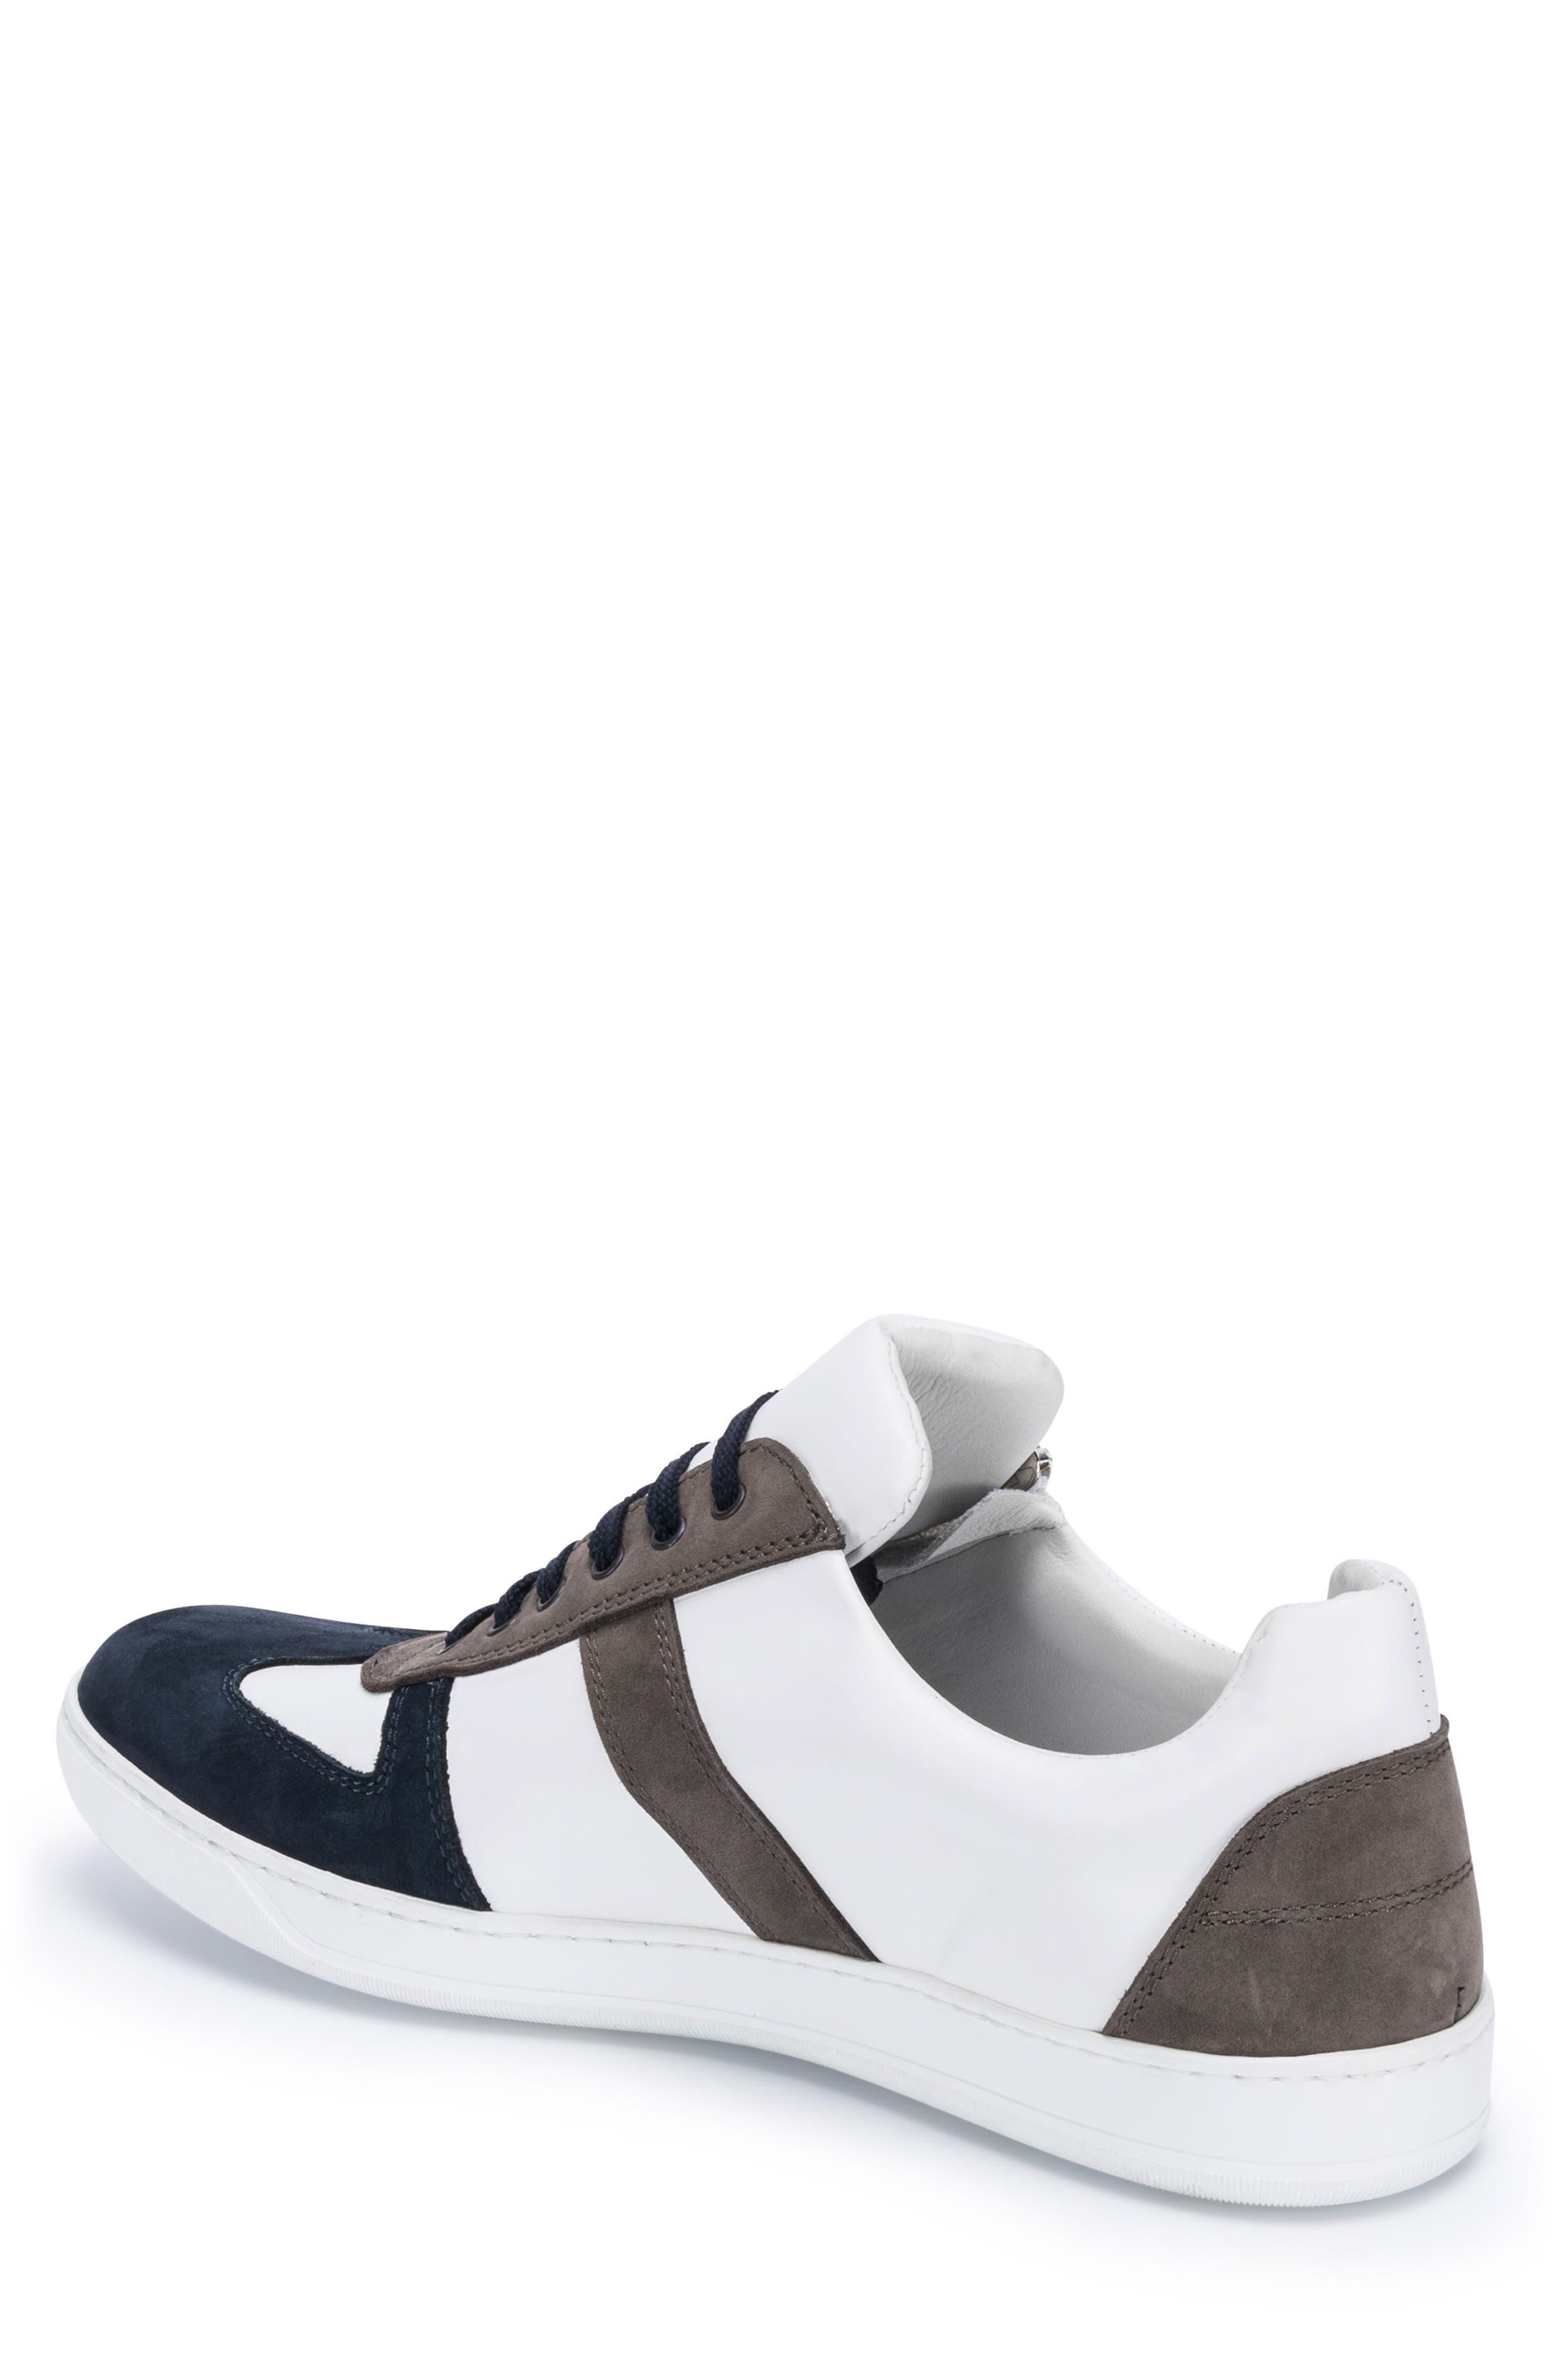 Calabria Sneaker,                             Alternate thumbnail 2, color,                             WHITE